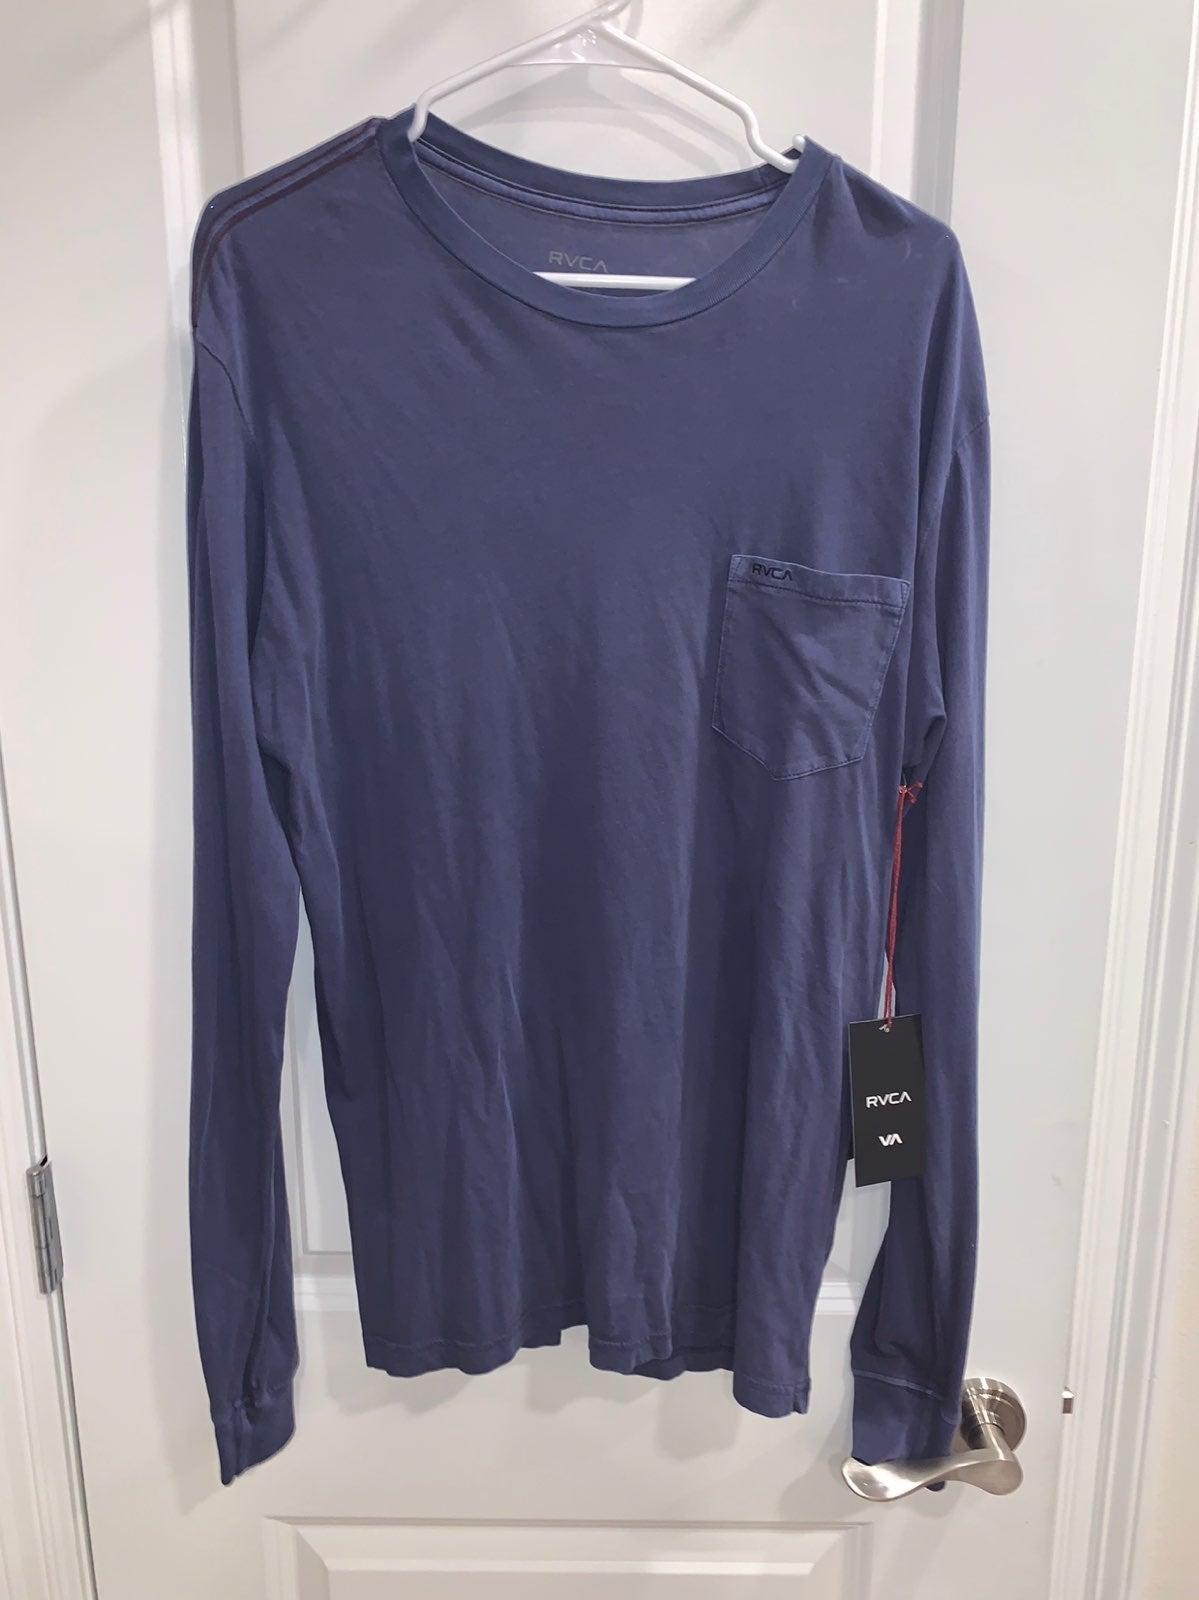 long sleeve shirts for men